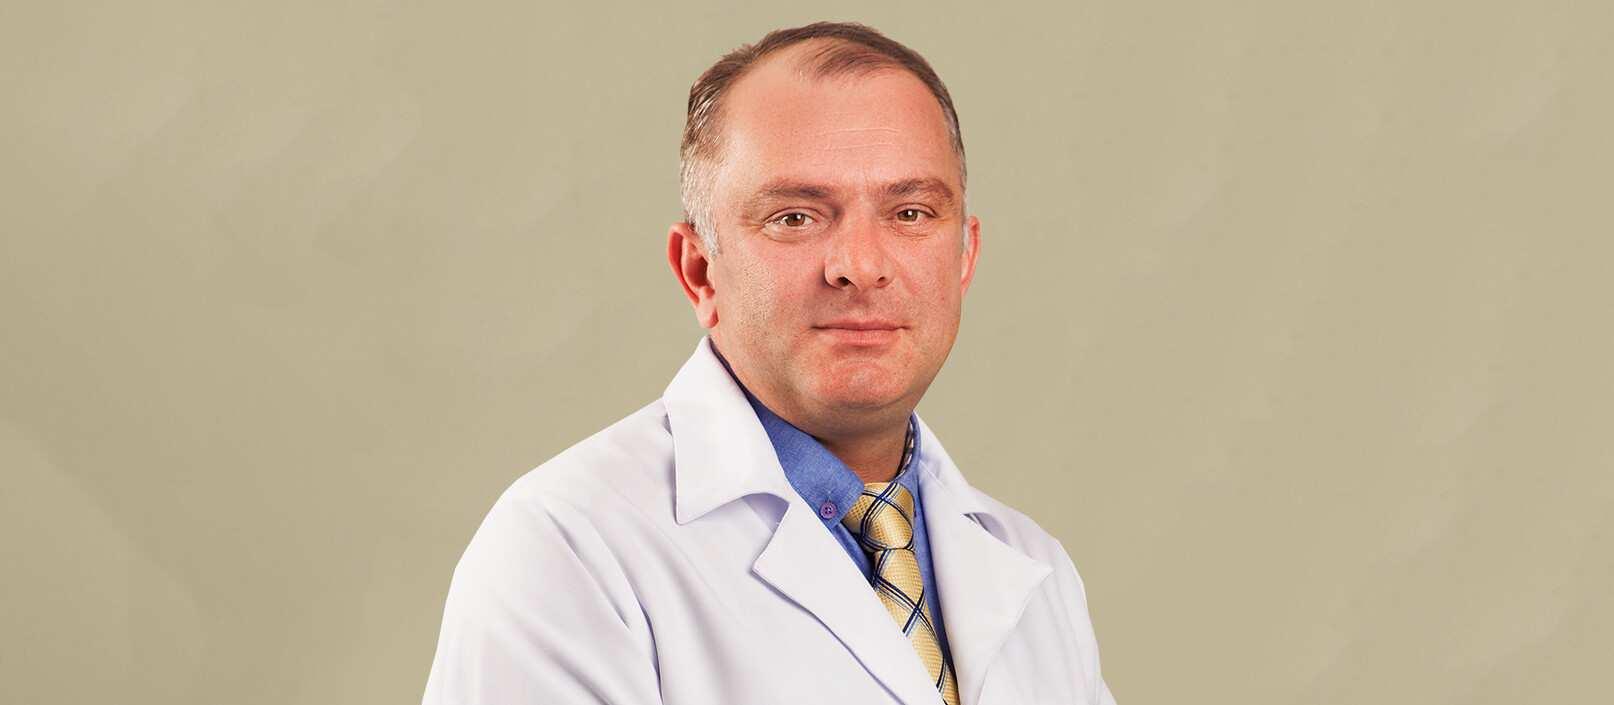 Vladimer Tsikarishvili MD, PhD